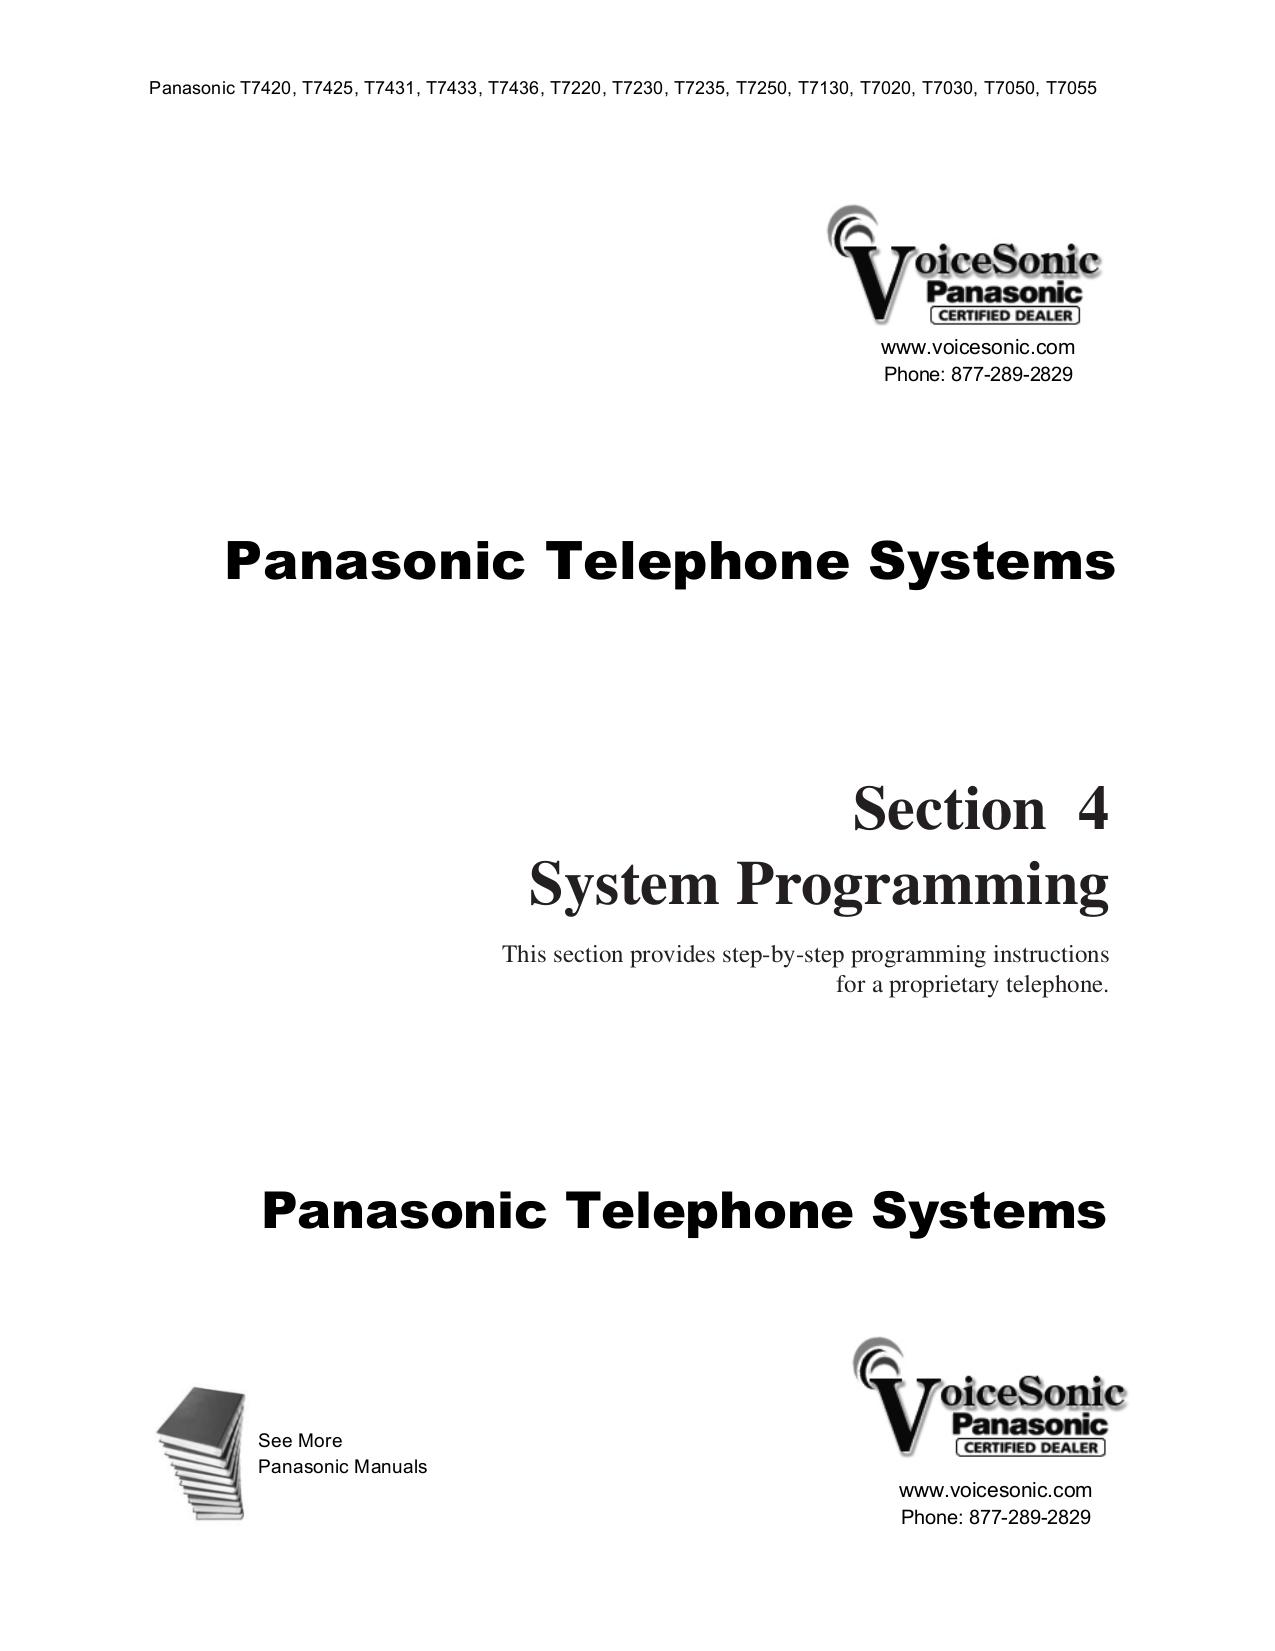 Panasonic kx-t7220 manual.